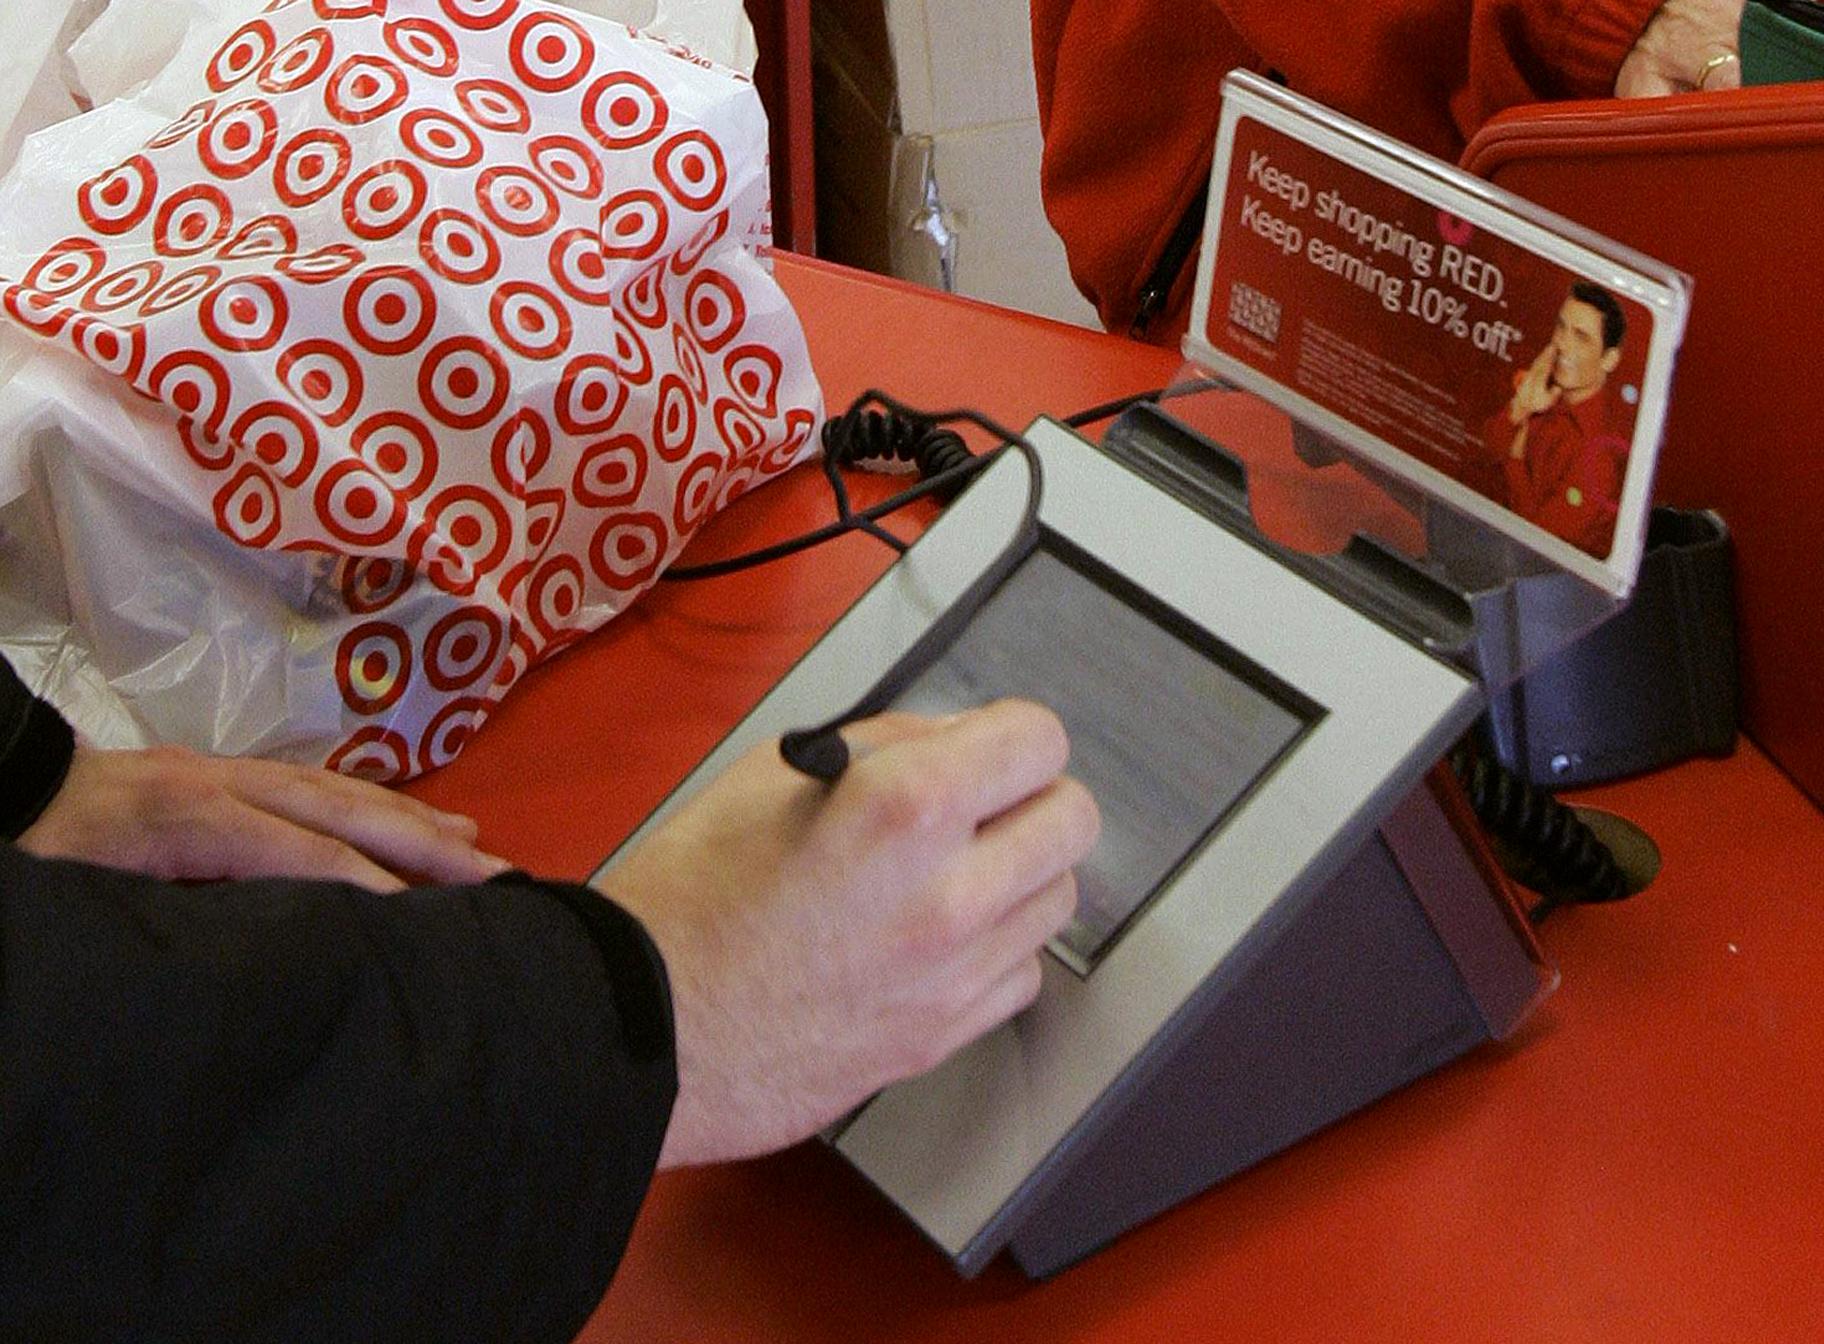 ap target credit card ll 131223 Target Reveals Source of Massive Card Hack